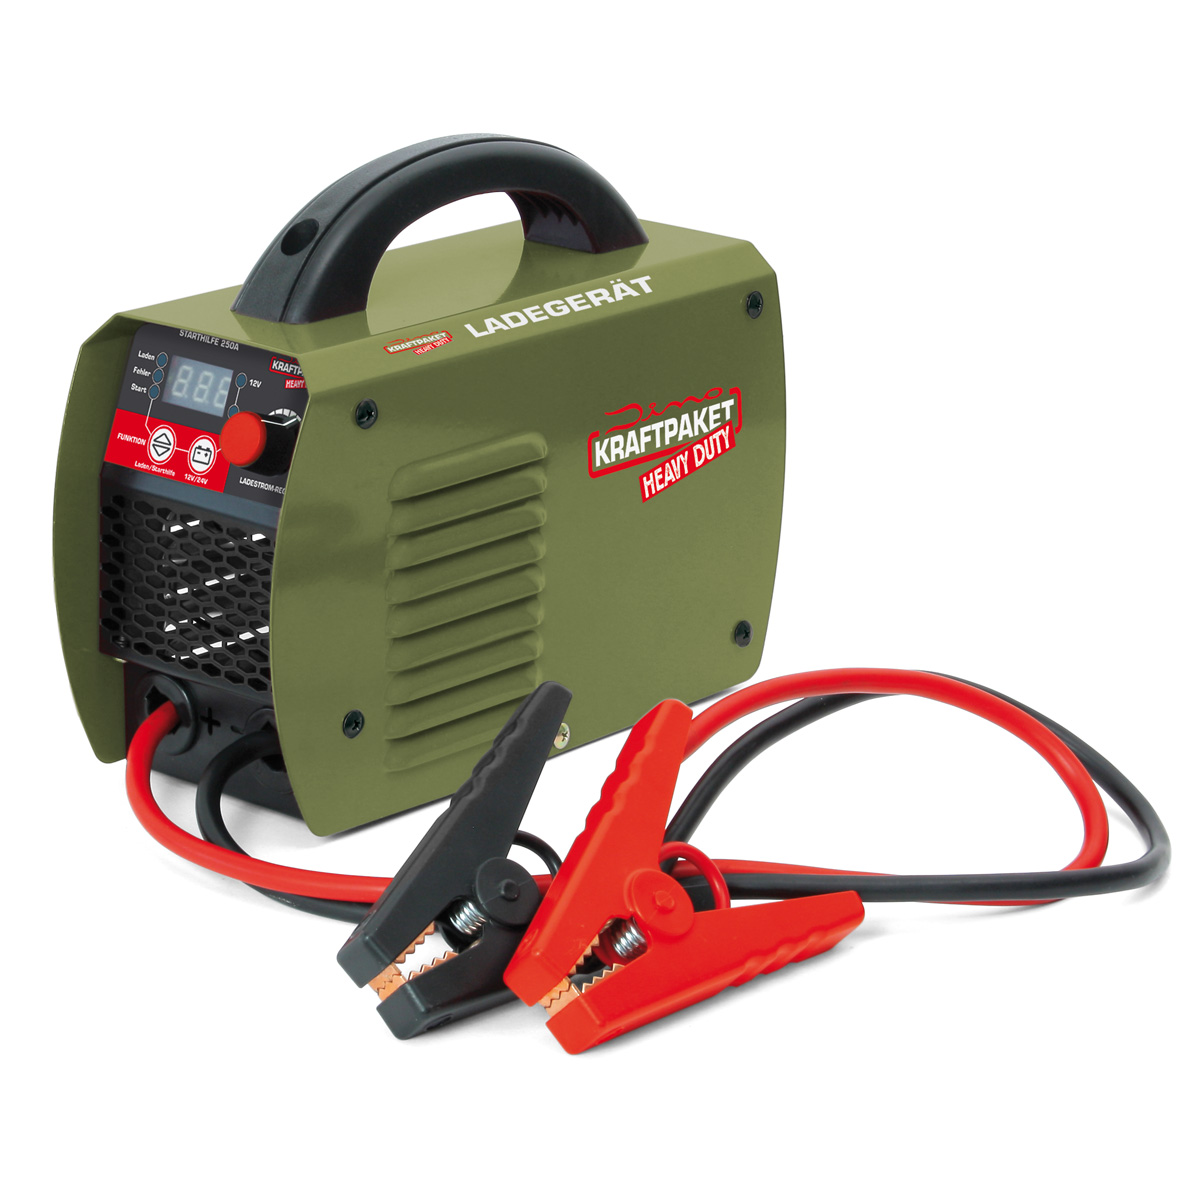 Dino Kraftpaket Heavy Duty Batterieladegerät und Starthilfe 250A 12V 24V 1-40A